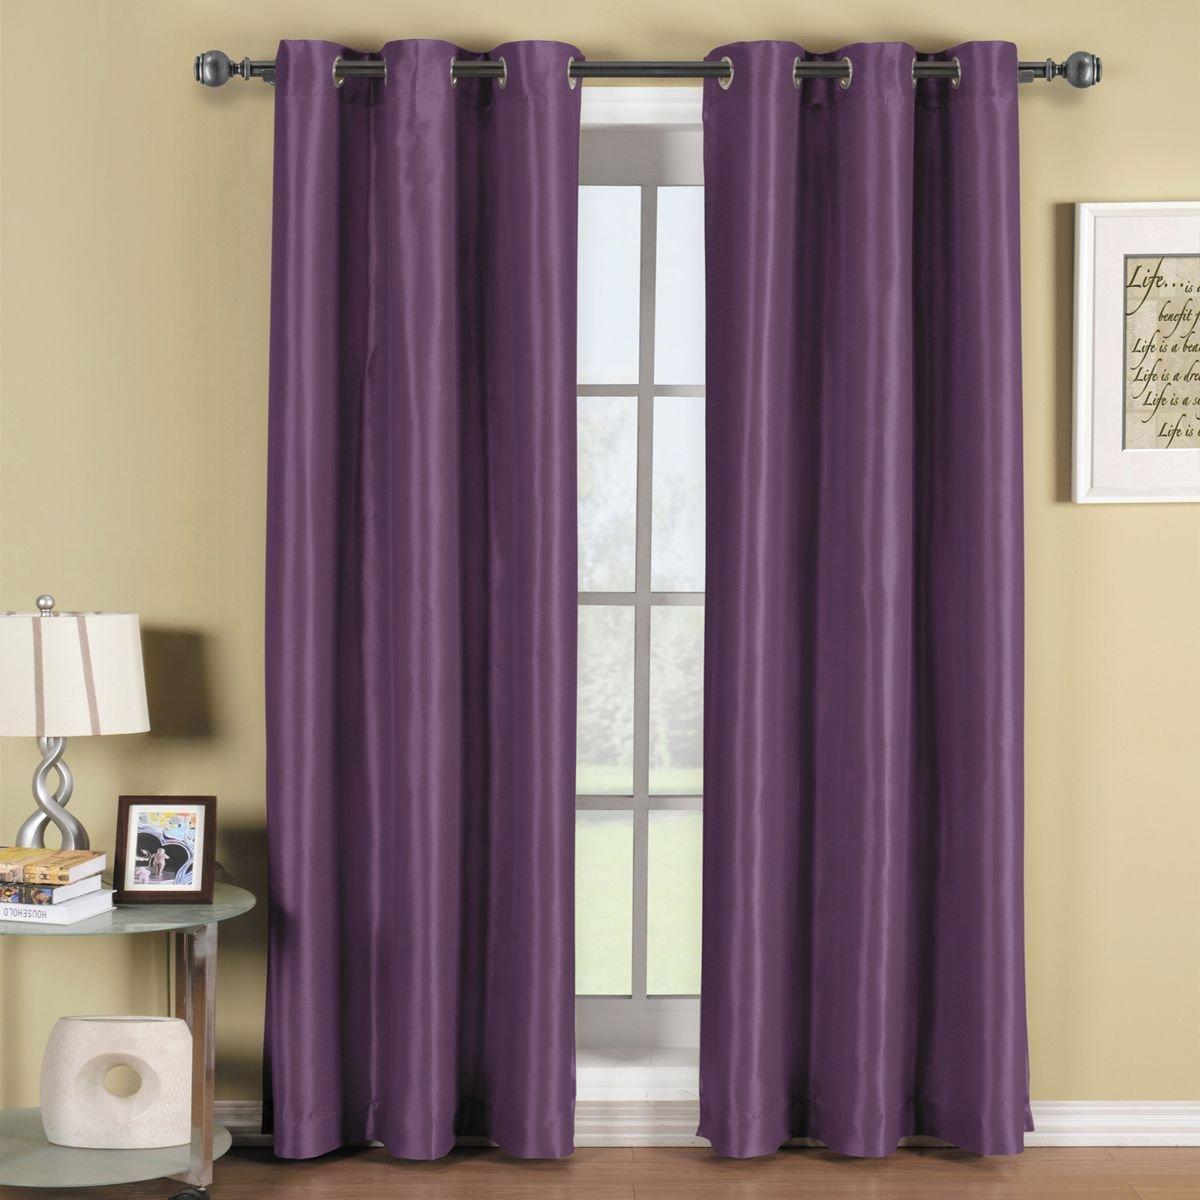 Pair of 2 Panels, Triple-Pass foam back layer, Thermal Blackout Window Curtain Set 84X63, Top Silver Grommet - 2 (42x63 Each Panel), Purple